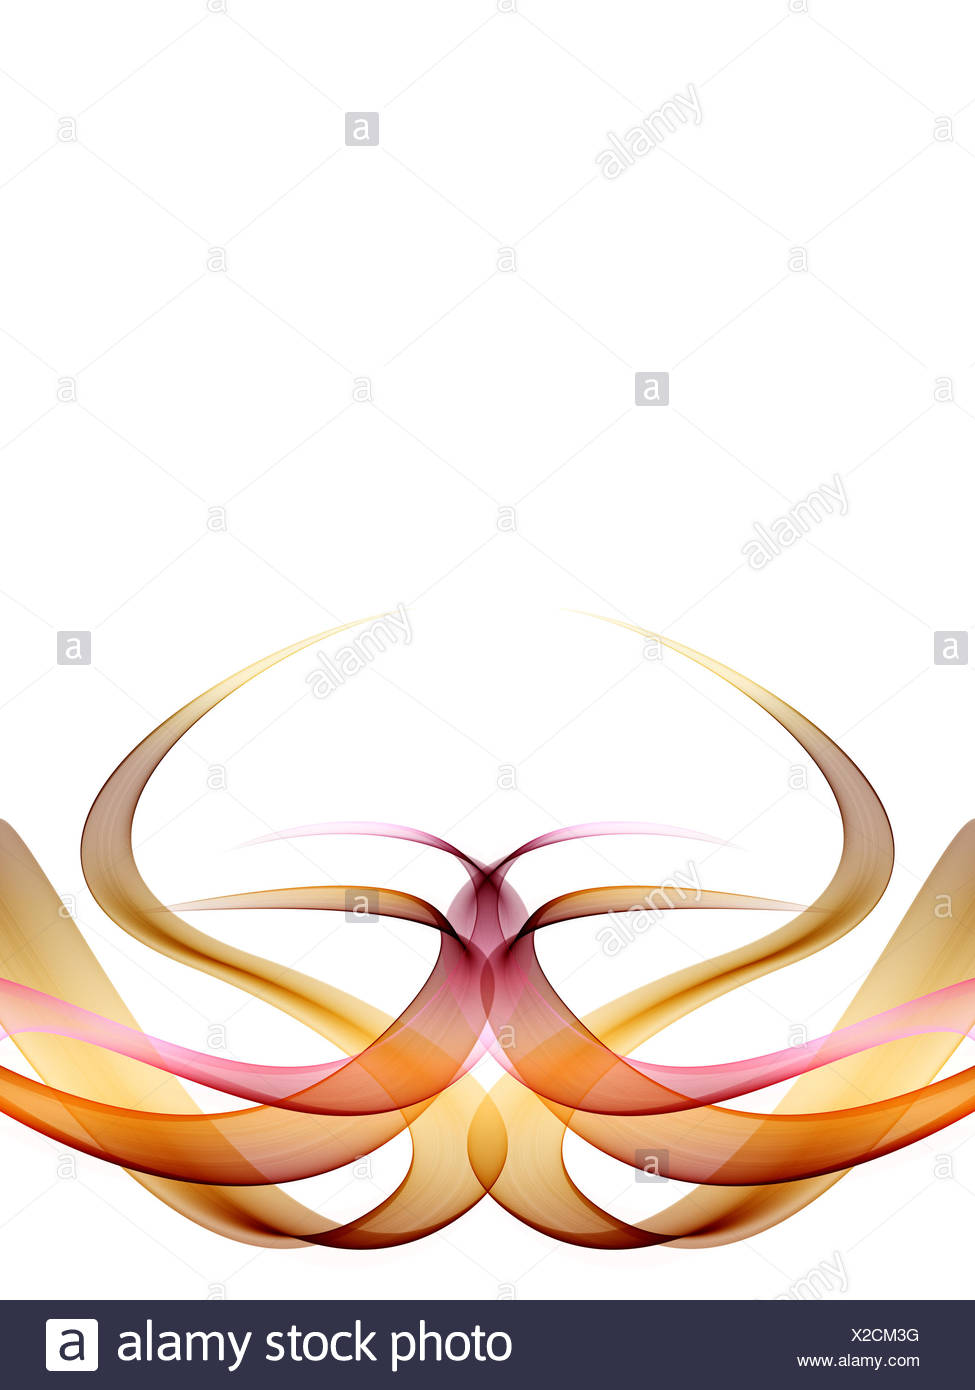 Diseño abstracto de progresión Imagen De Stock